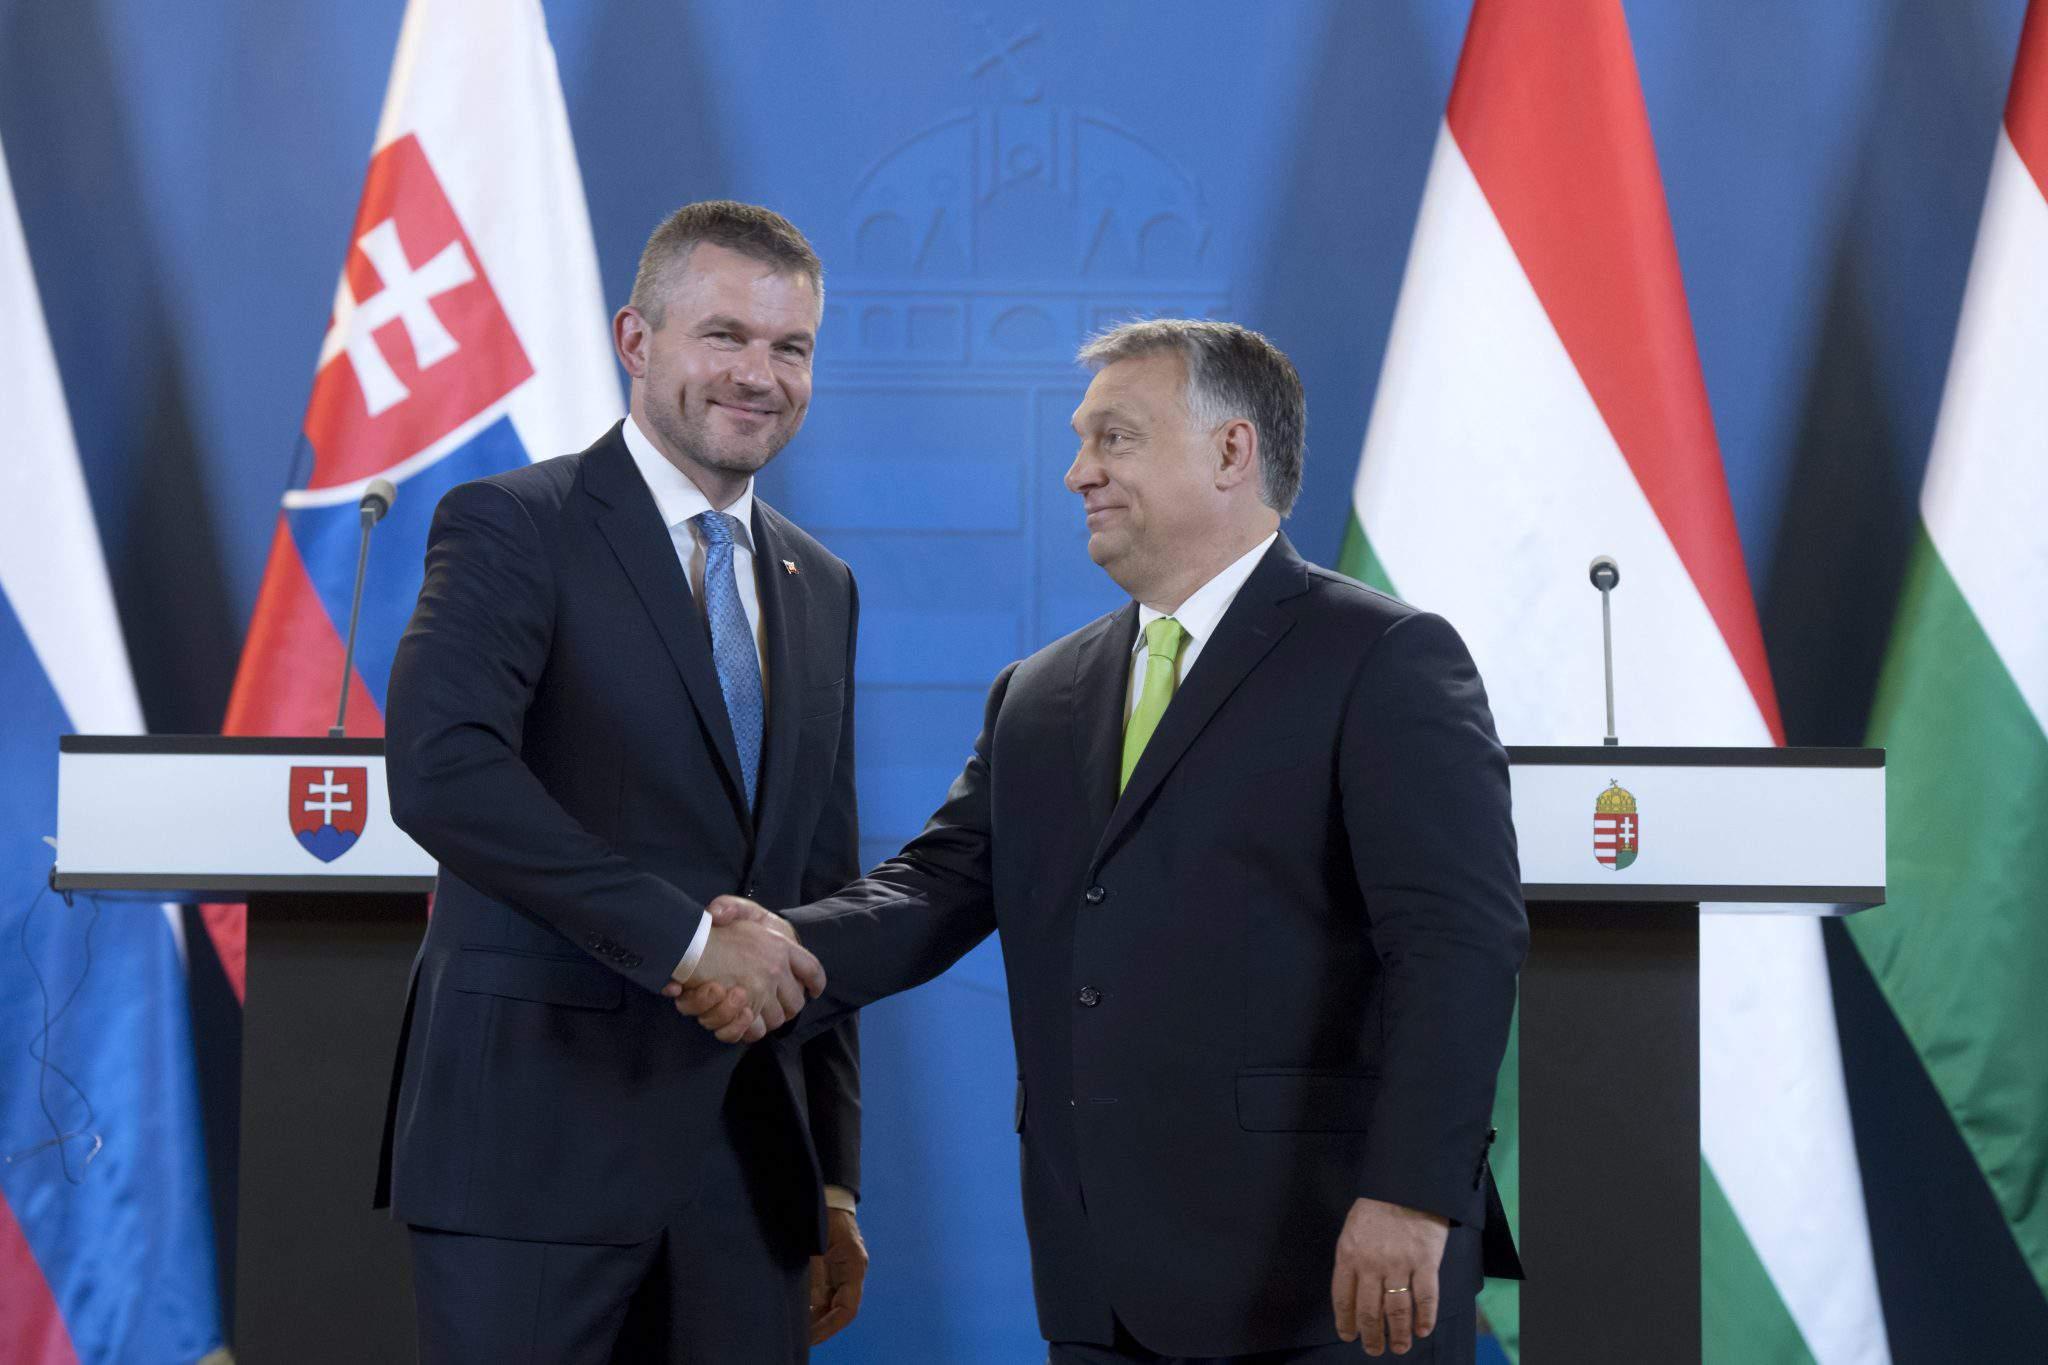 Slovakia Hungary Prime Minister cooperation